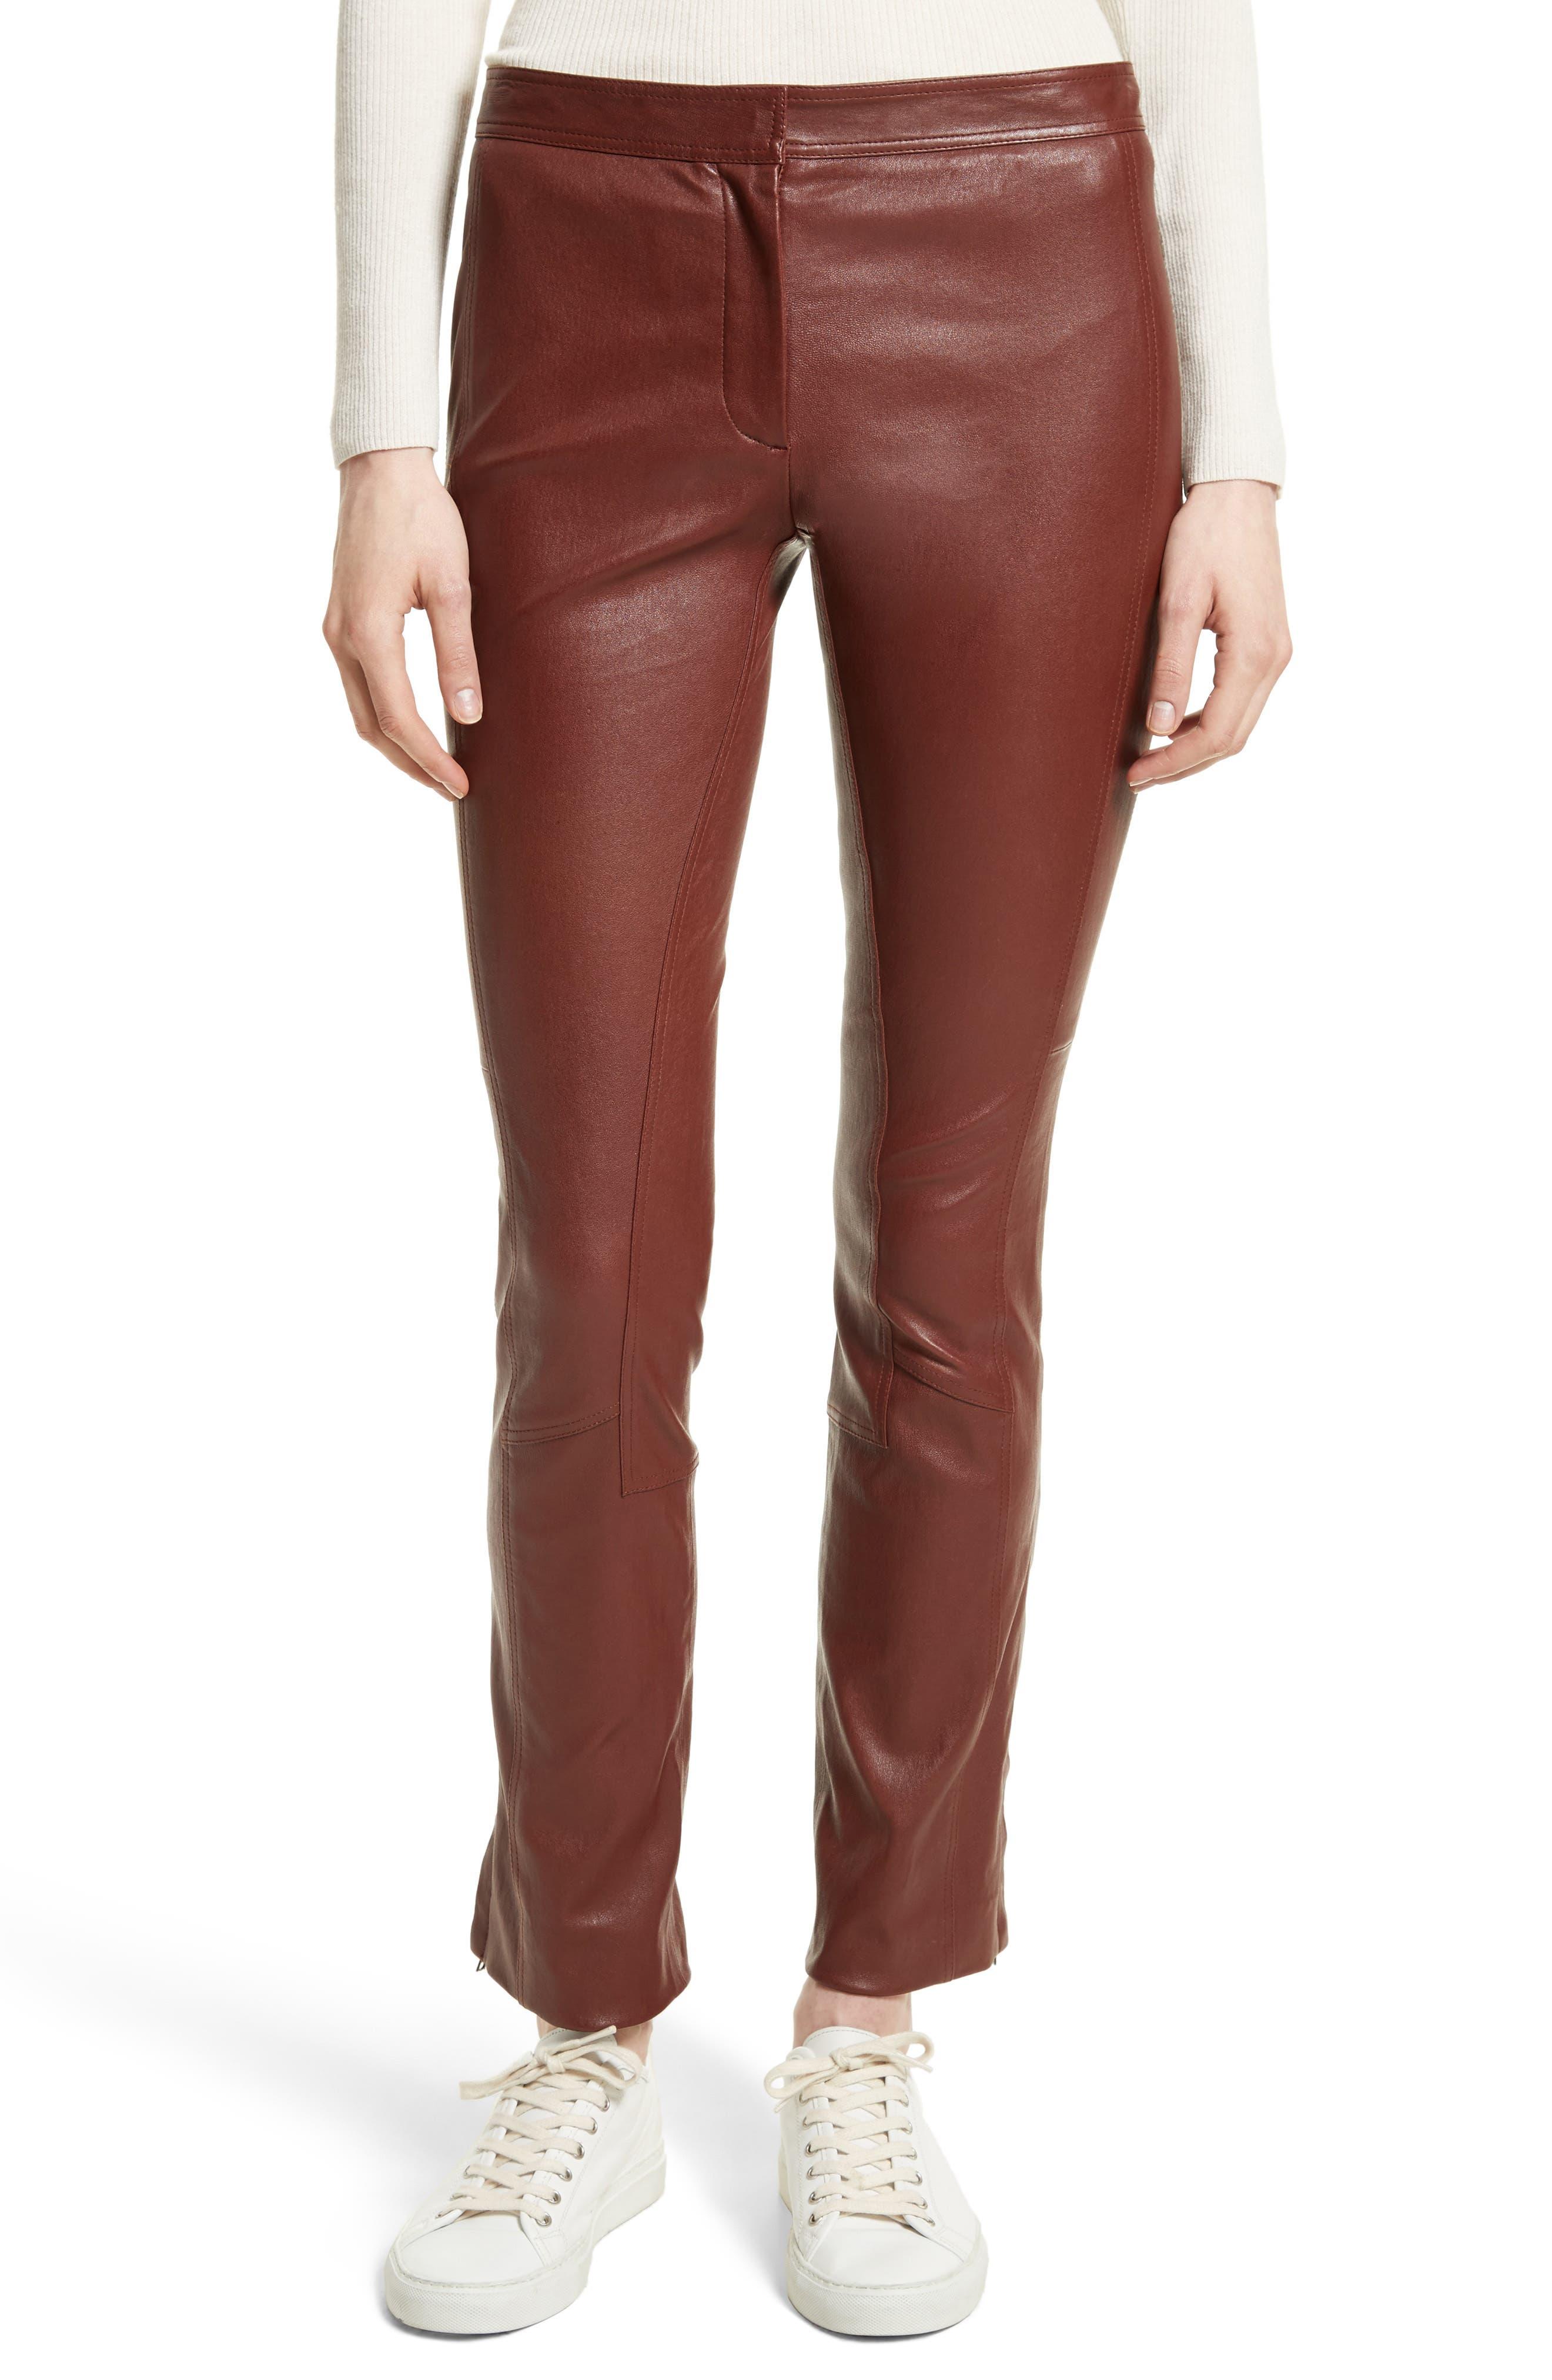 Bristol Leather Riding Pants,                         Main,                         color, 215